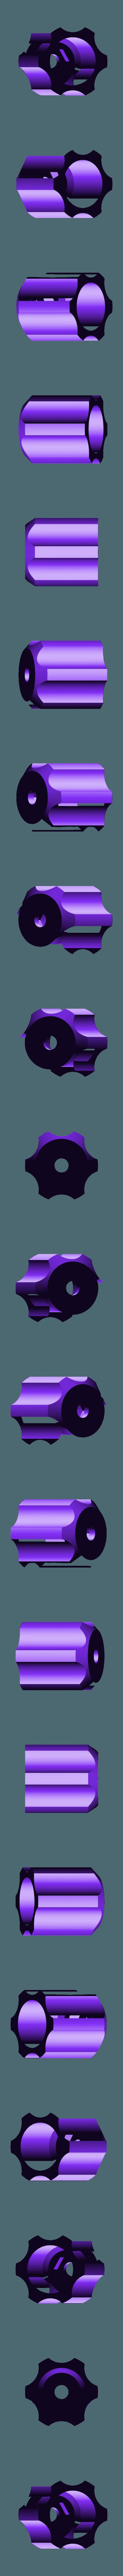 filament_pressure_bar_knob.stl Download free STL file Geared Extruder using M8 extruder driver • 3D printable template, Job